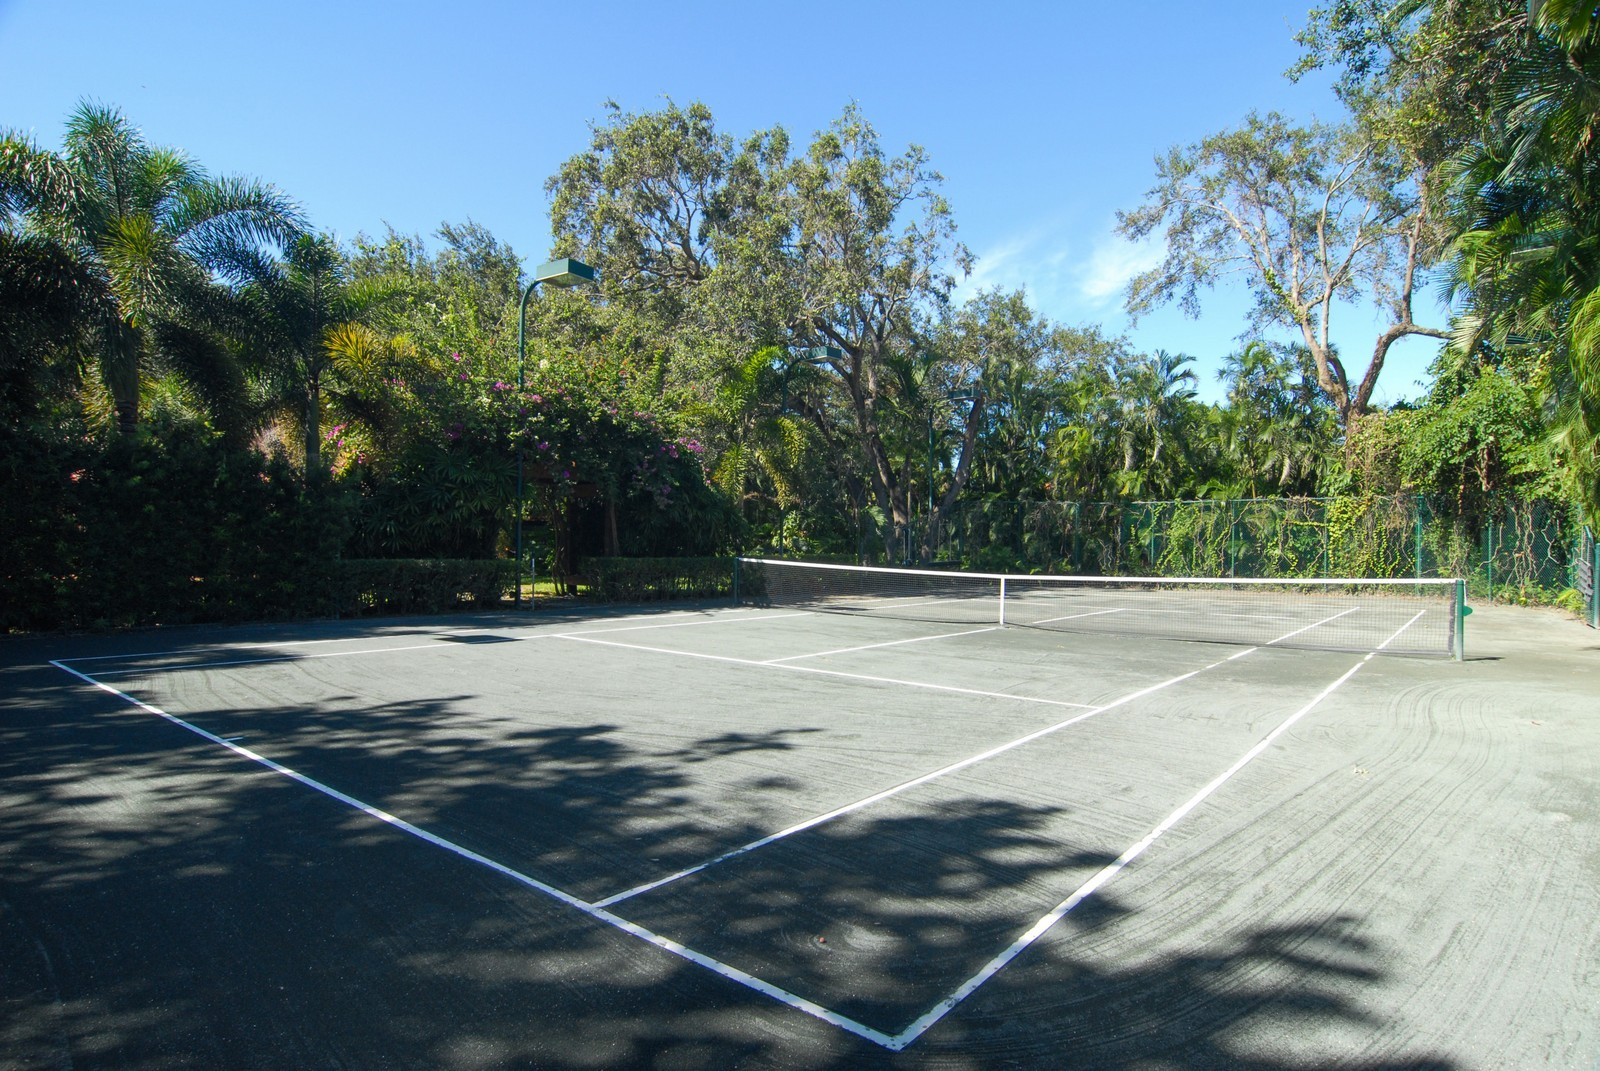 Real Estate Photography - 4845 Davis Rd, Miami, FL, 33143 - Tennis Court